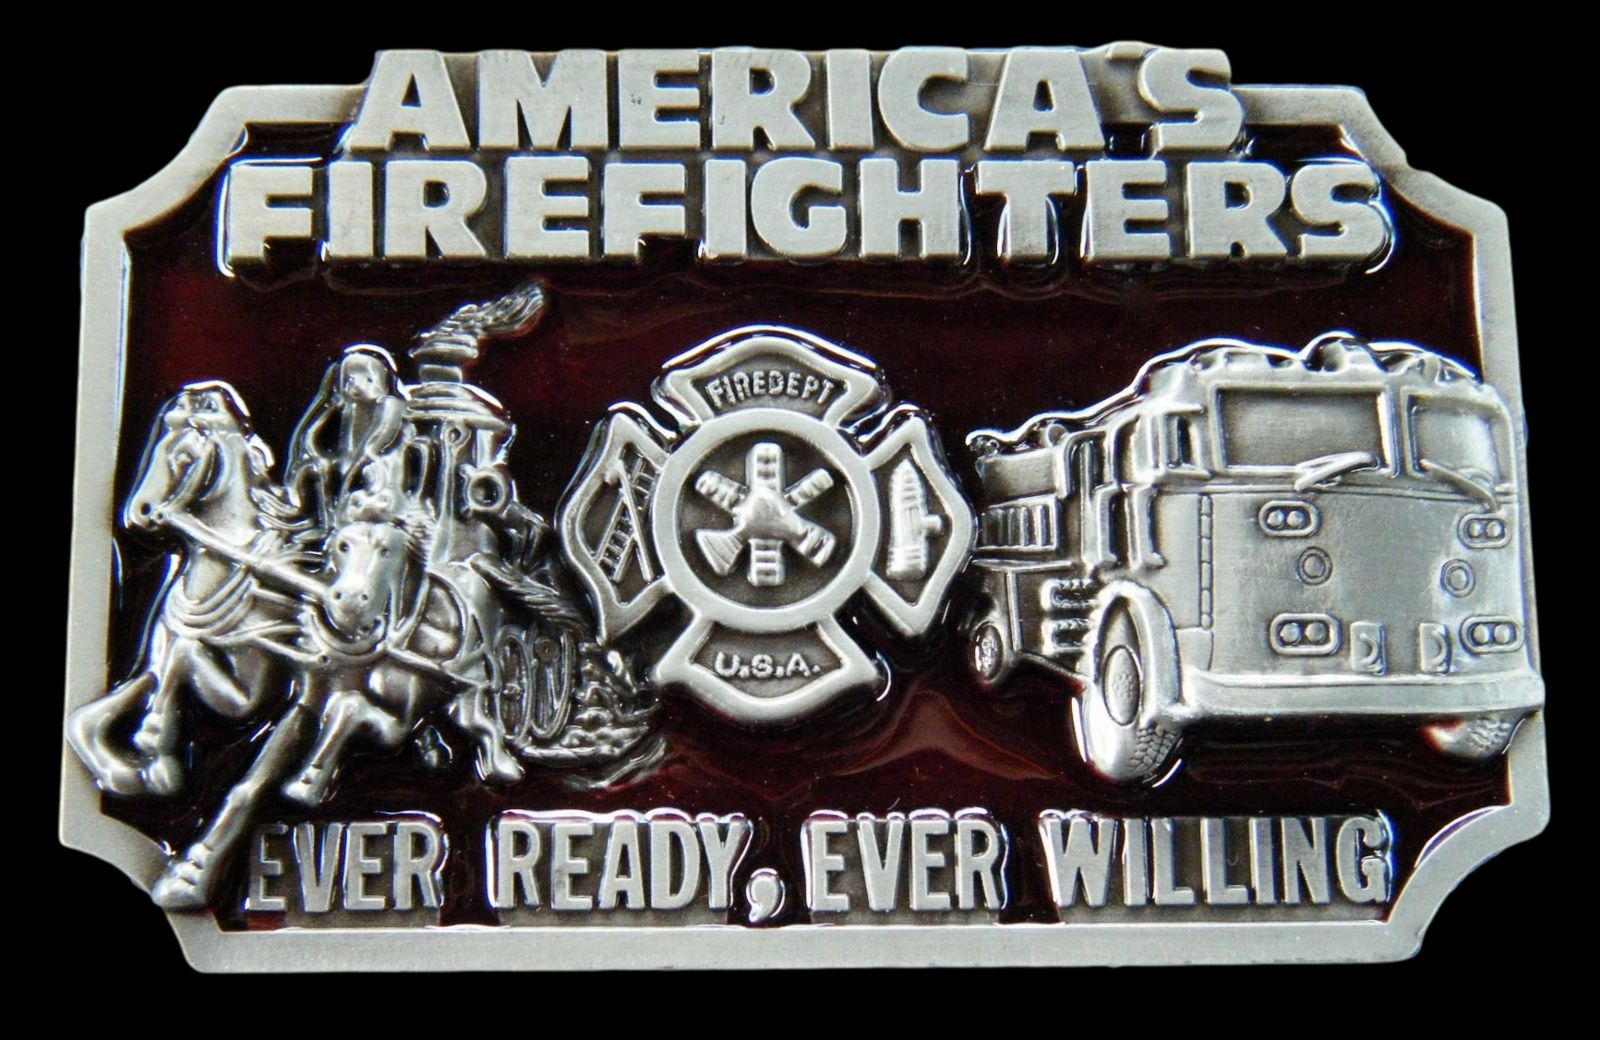 Volunteer Fire Fighter Fire Engine Truck Metal Belt Buckle